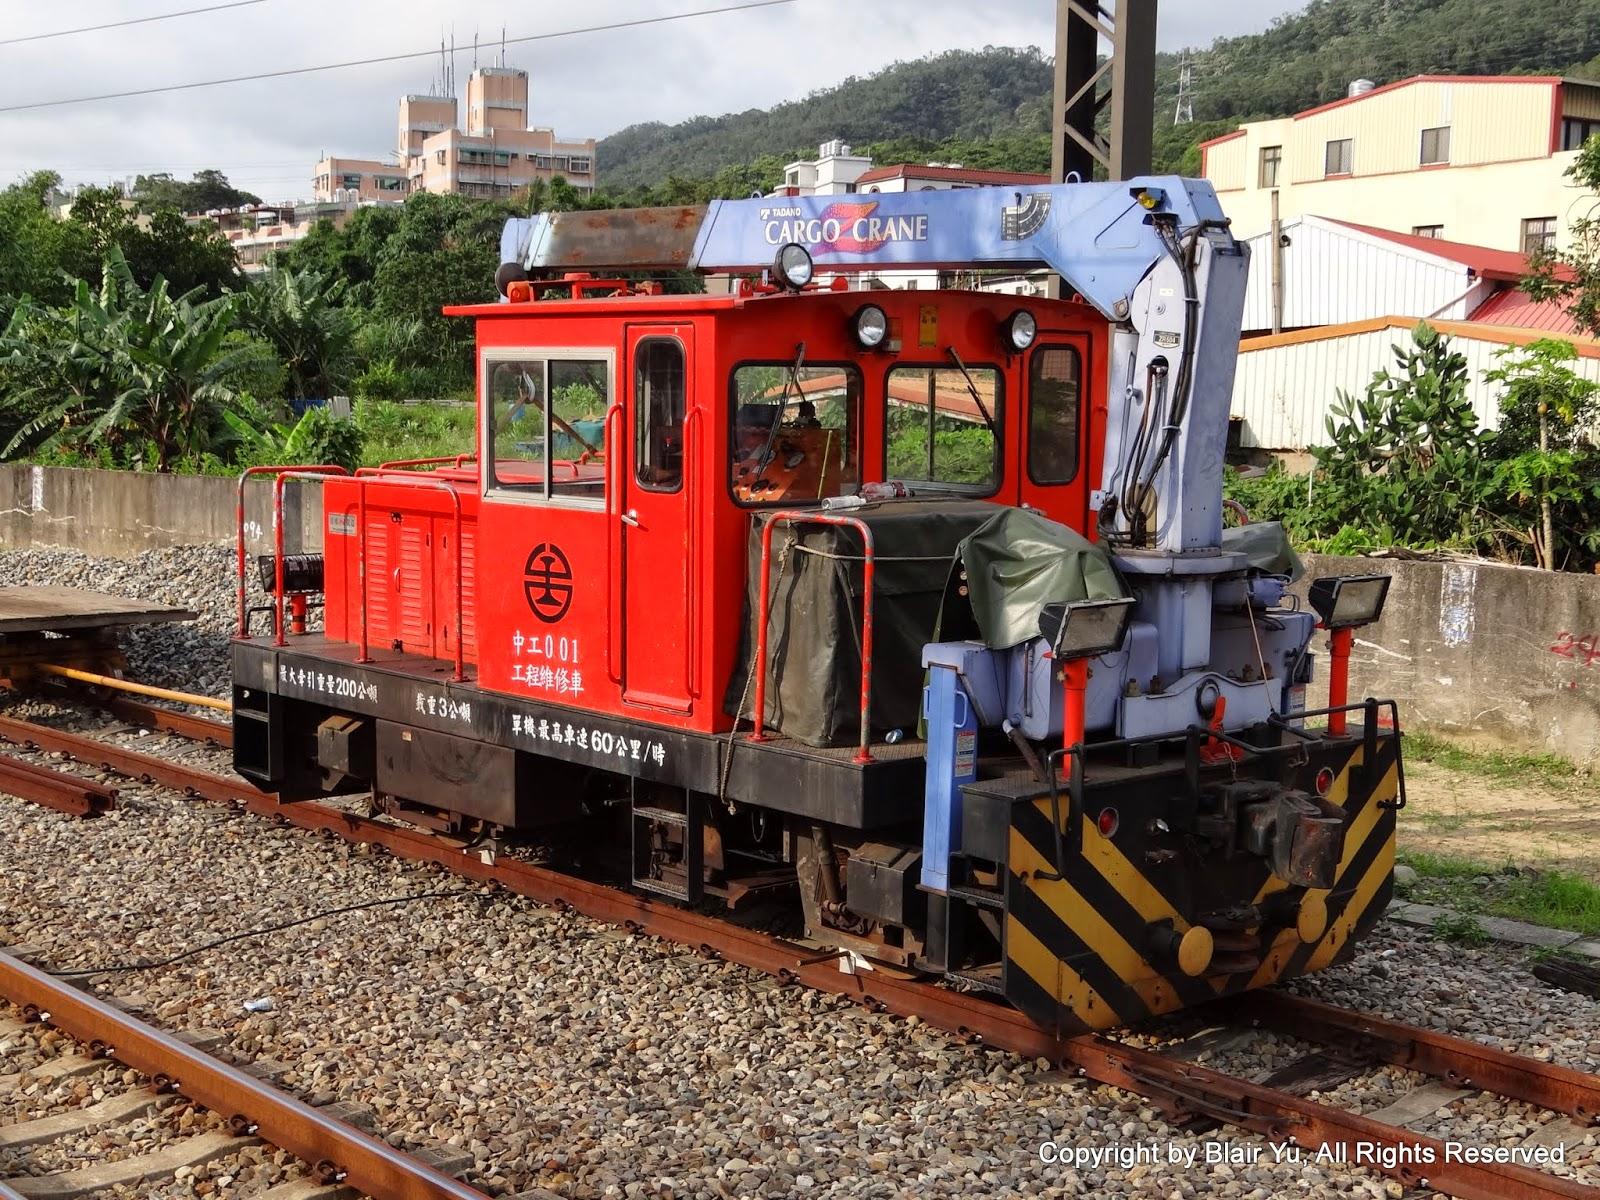 Blair's 鐵道攝影: 中工001工程維修車